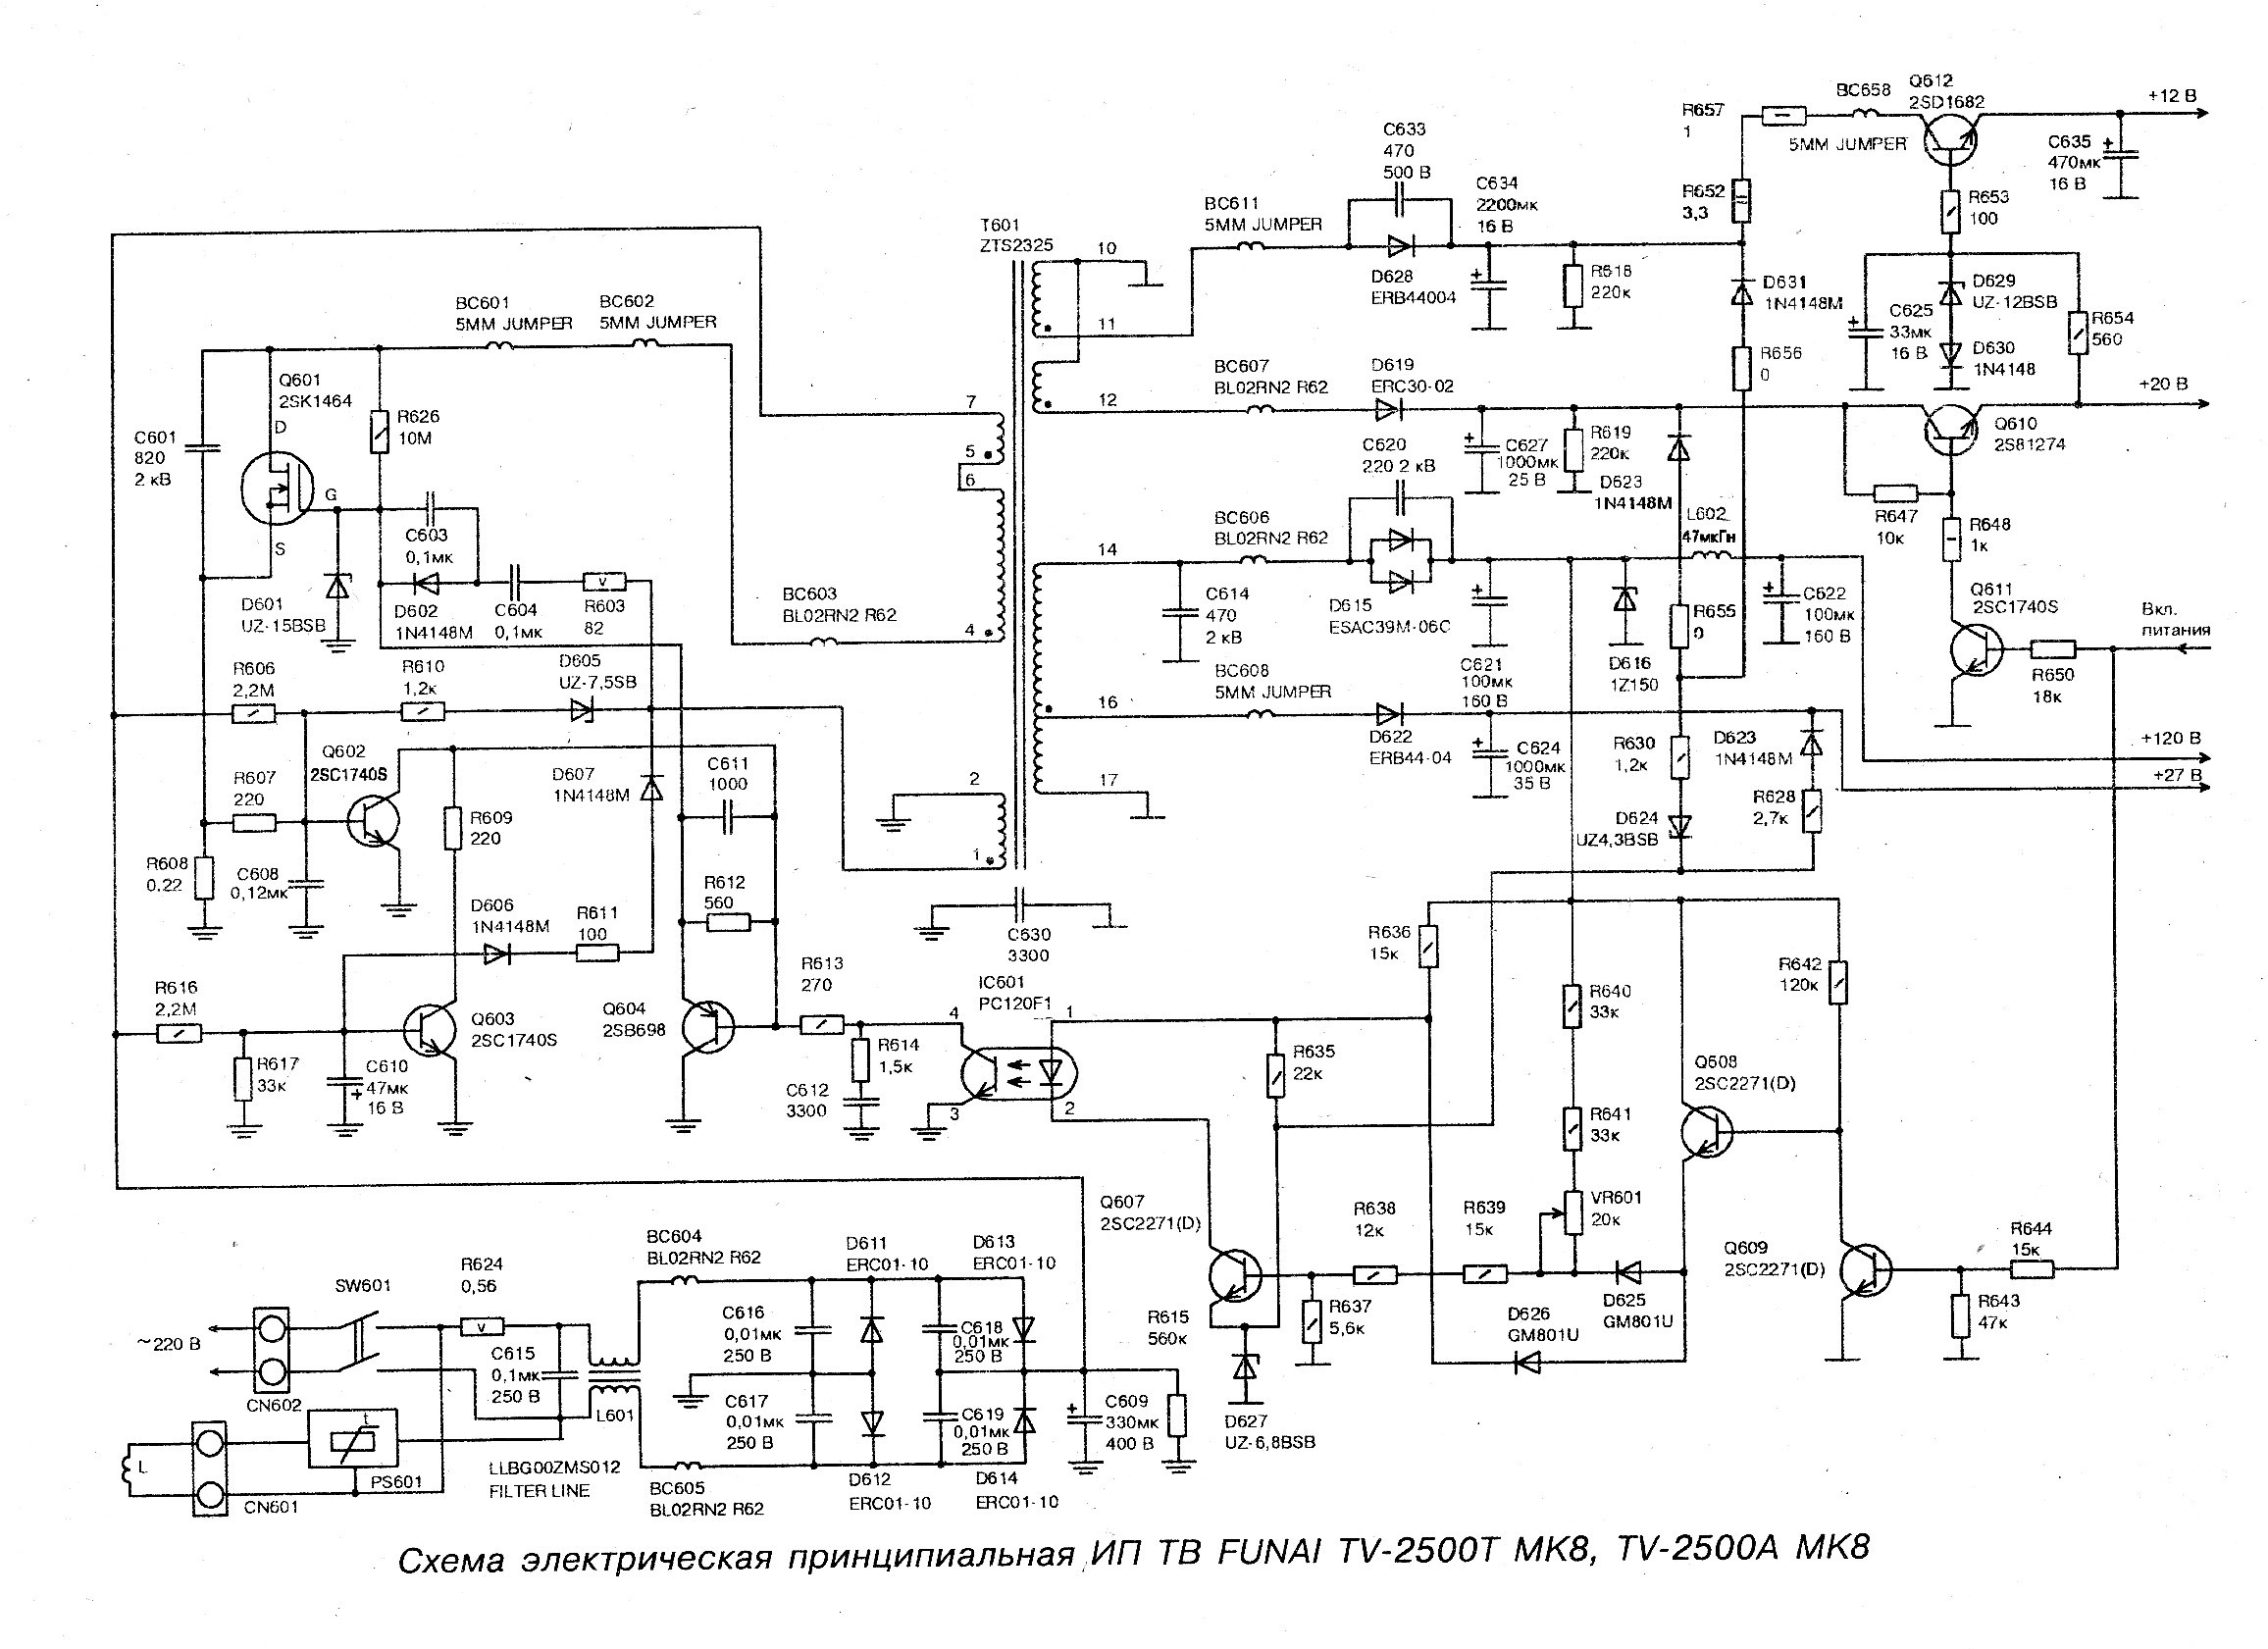 Схема для телевизора эленберг